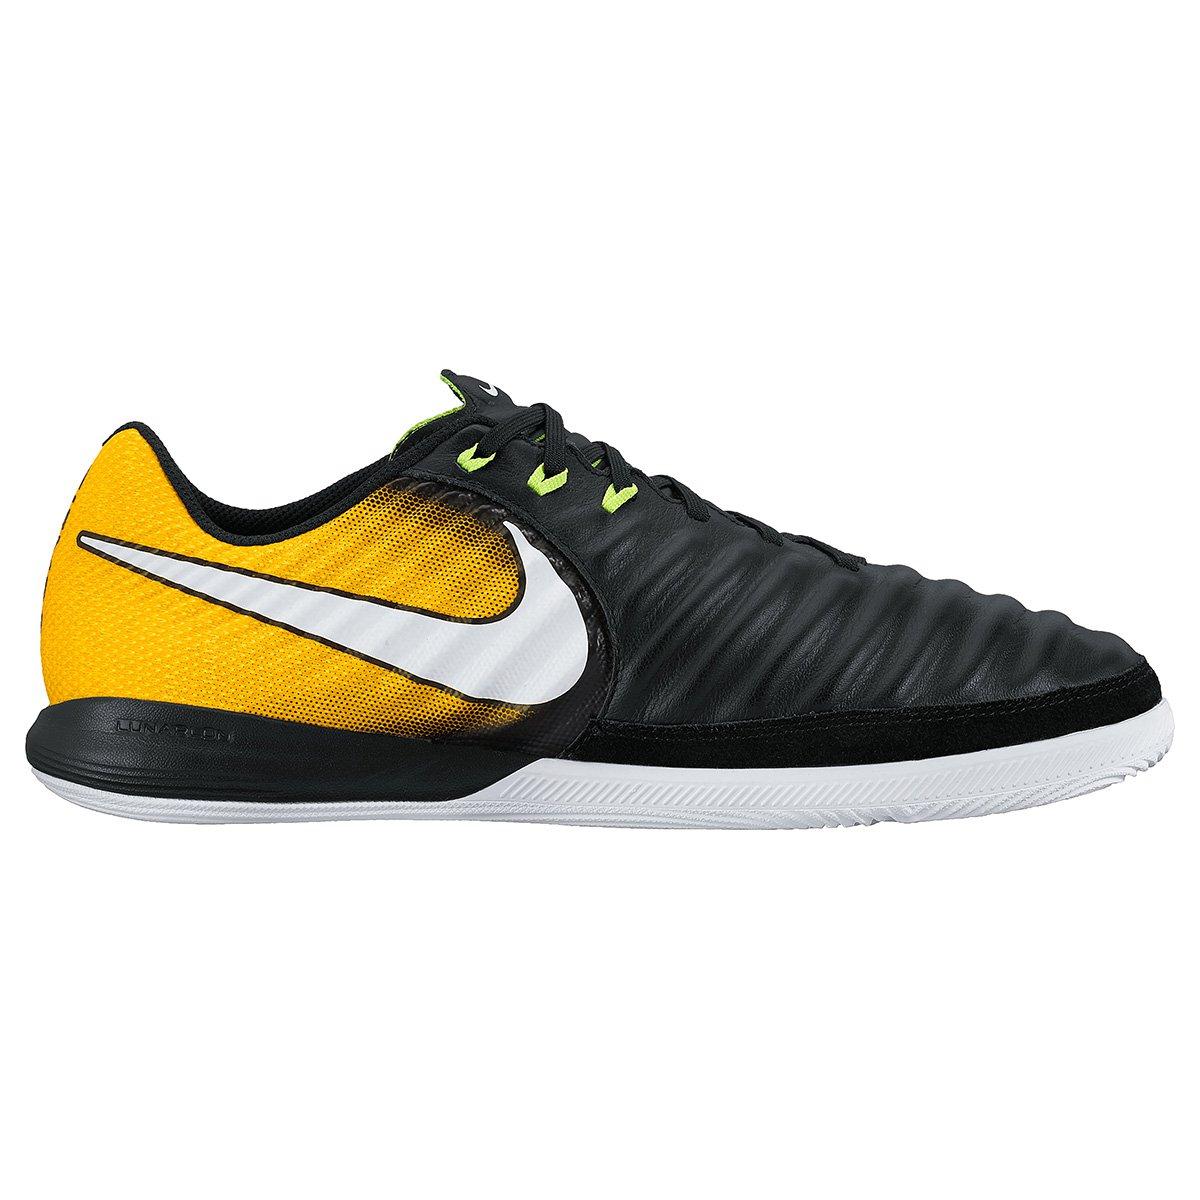 020820eea11b9 Chuteira Futsal Nike Tiempo Finale IC - Compre Agora